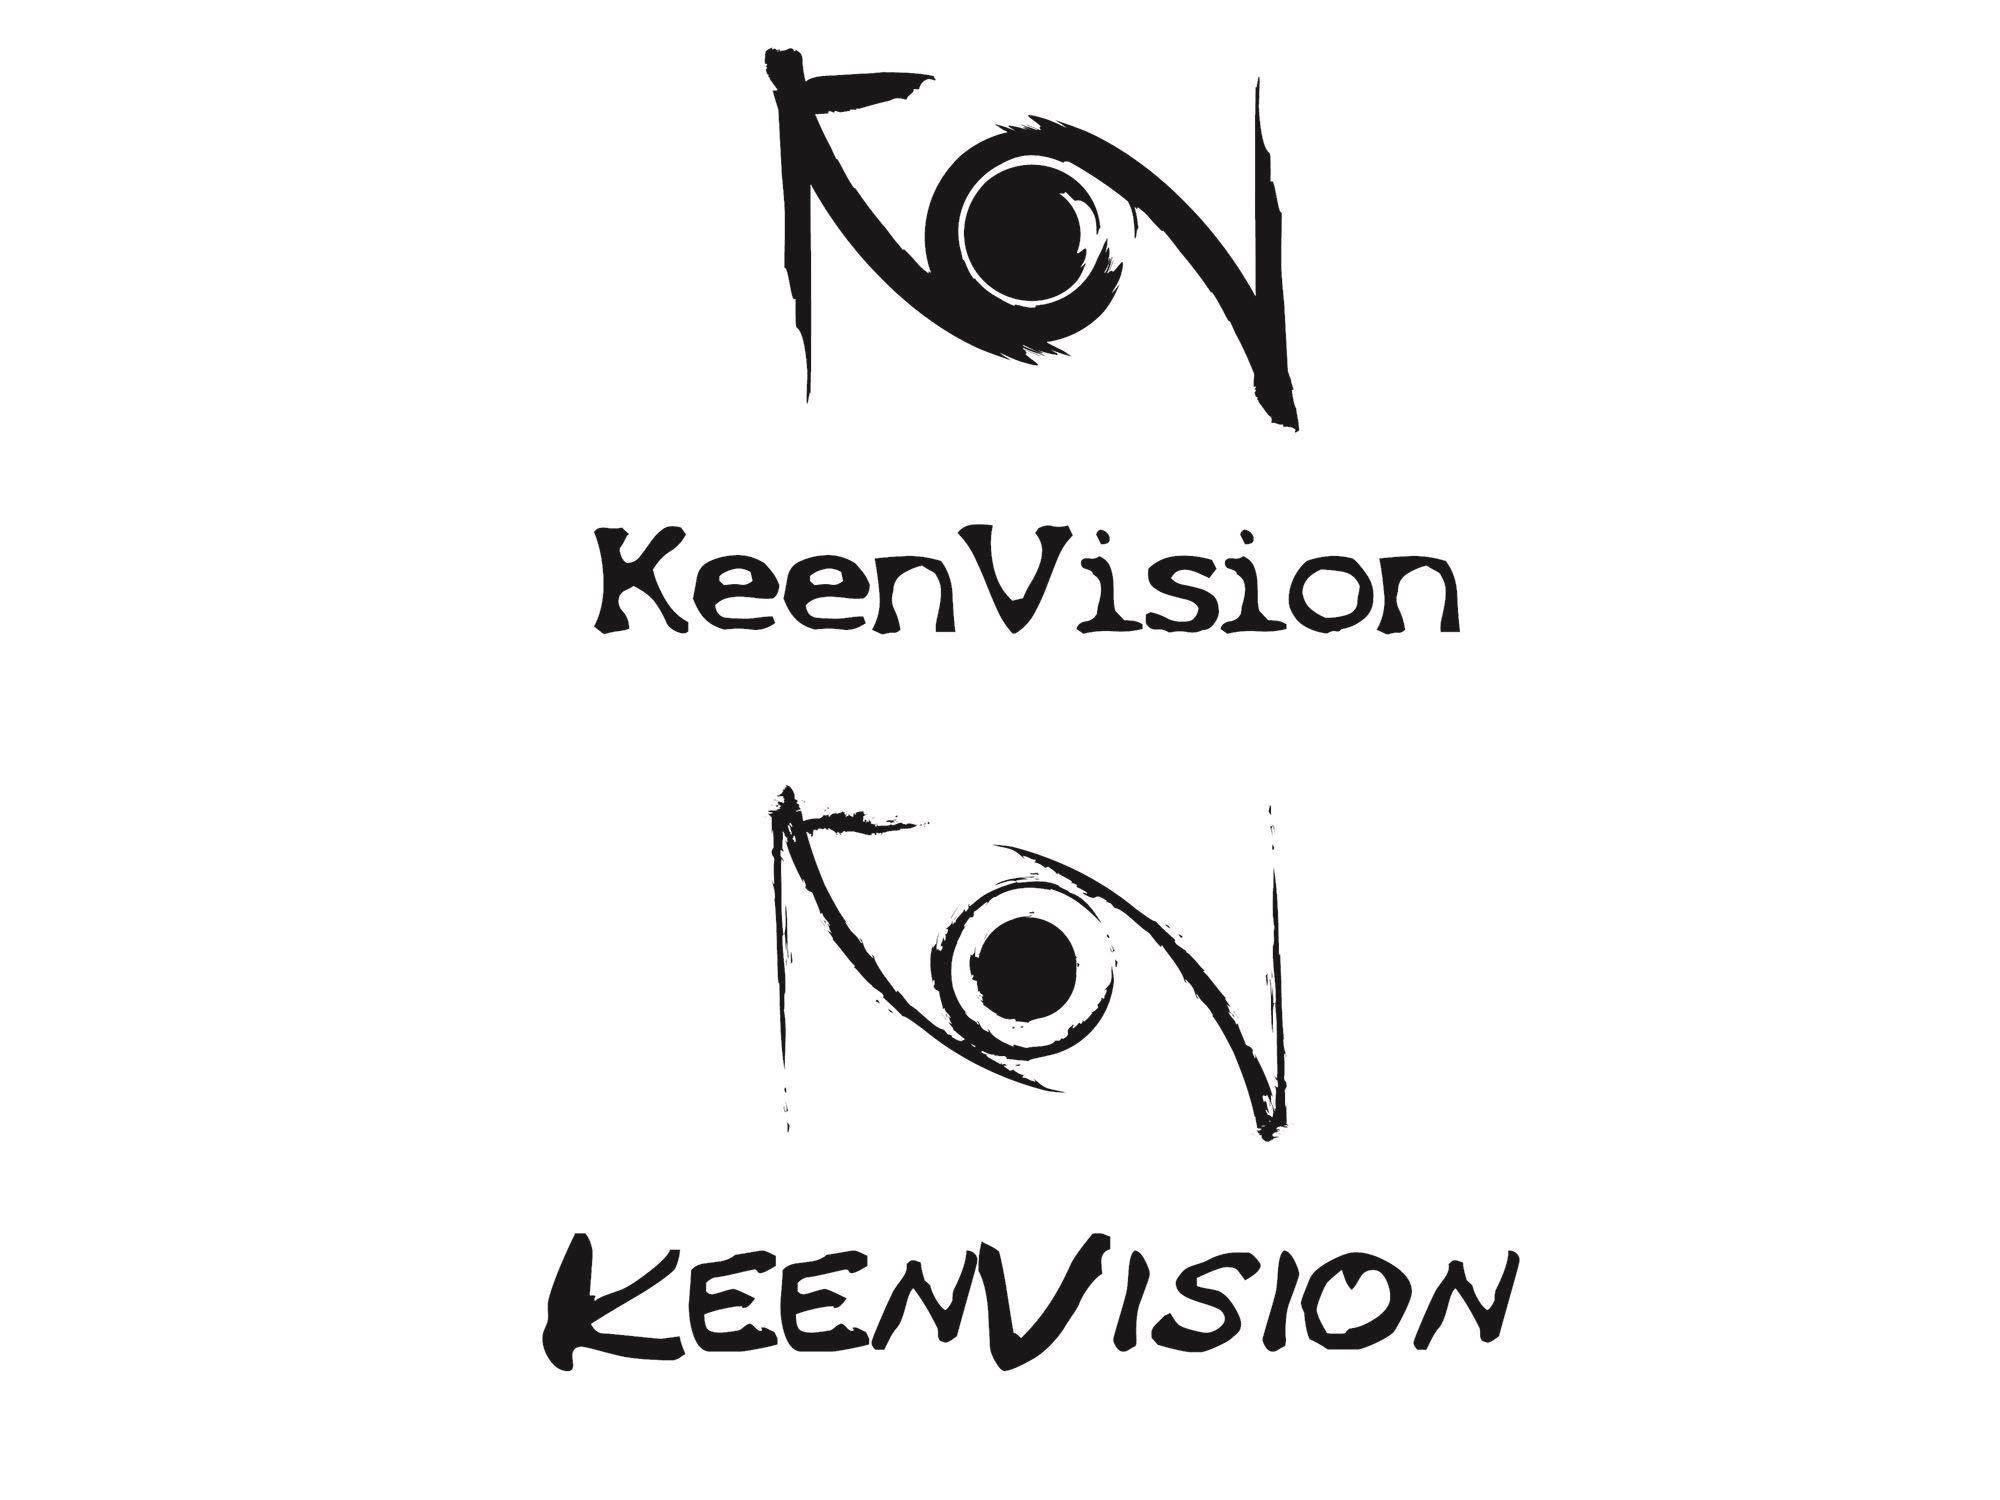 Логотип для KeenVision - дизайнер Orange8unny